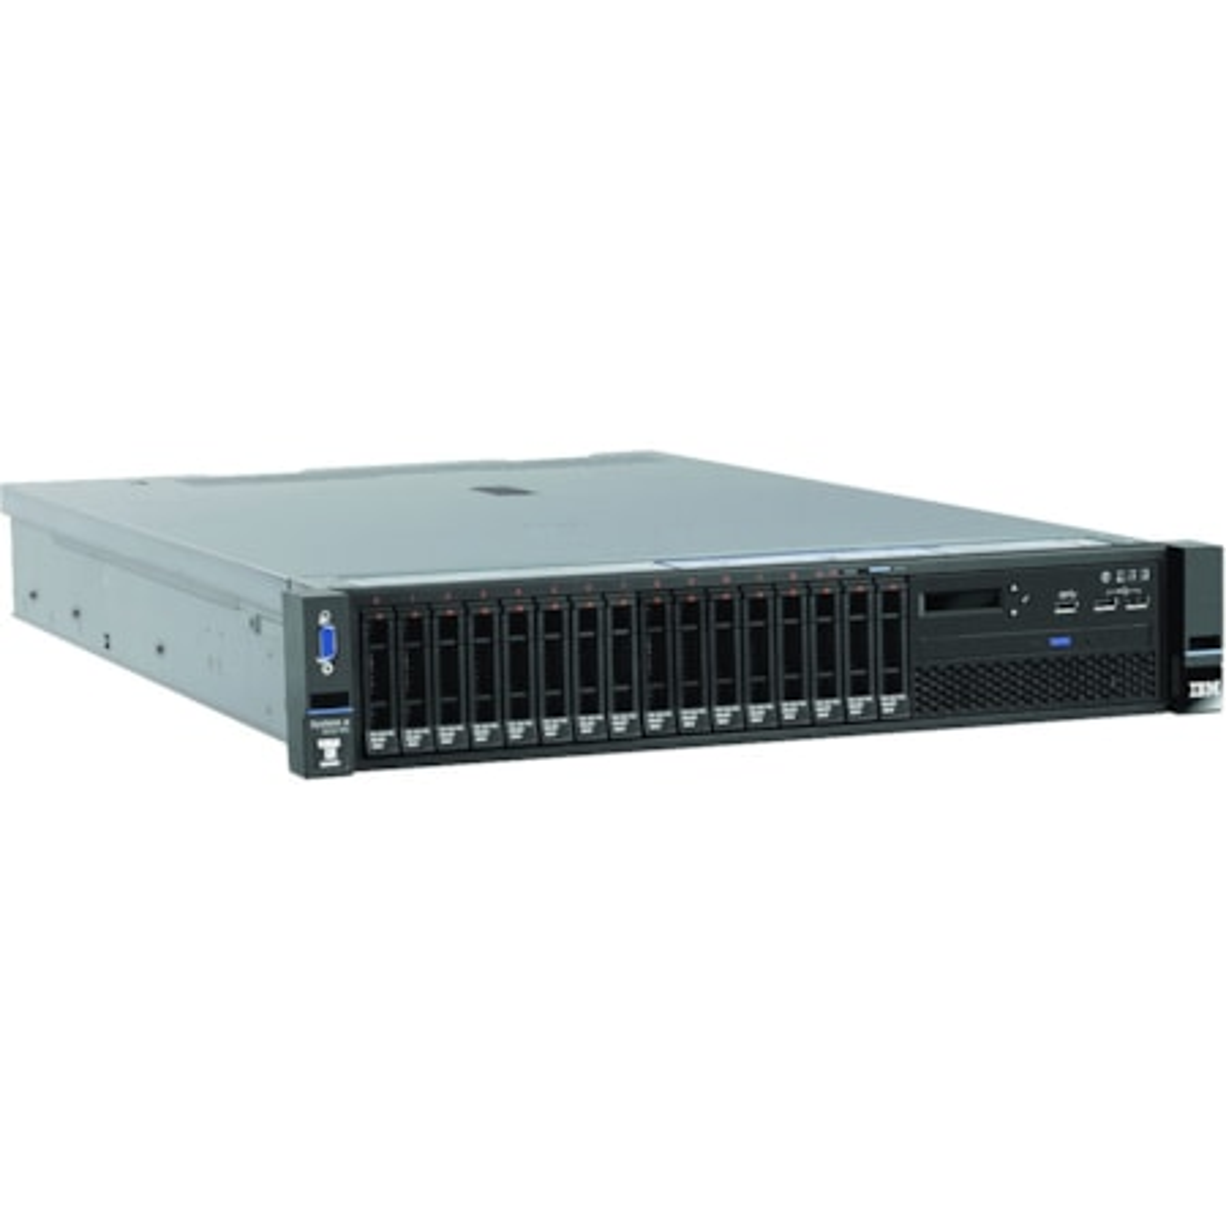 Lenovo System x x3650 M5 887110X 2U Rack-mountable Server - 1 x Intel Xeon E5-2603 v4 Hexa-core (6 Core) 1.70 GHz - 8 GB Installed TruDDR4 - 12Gb/s SAS, Serial ATA/600 Controller - 0, 1, 10 RAID Levels - 1 x 550 W